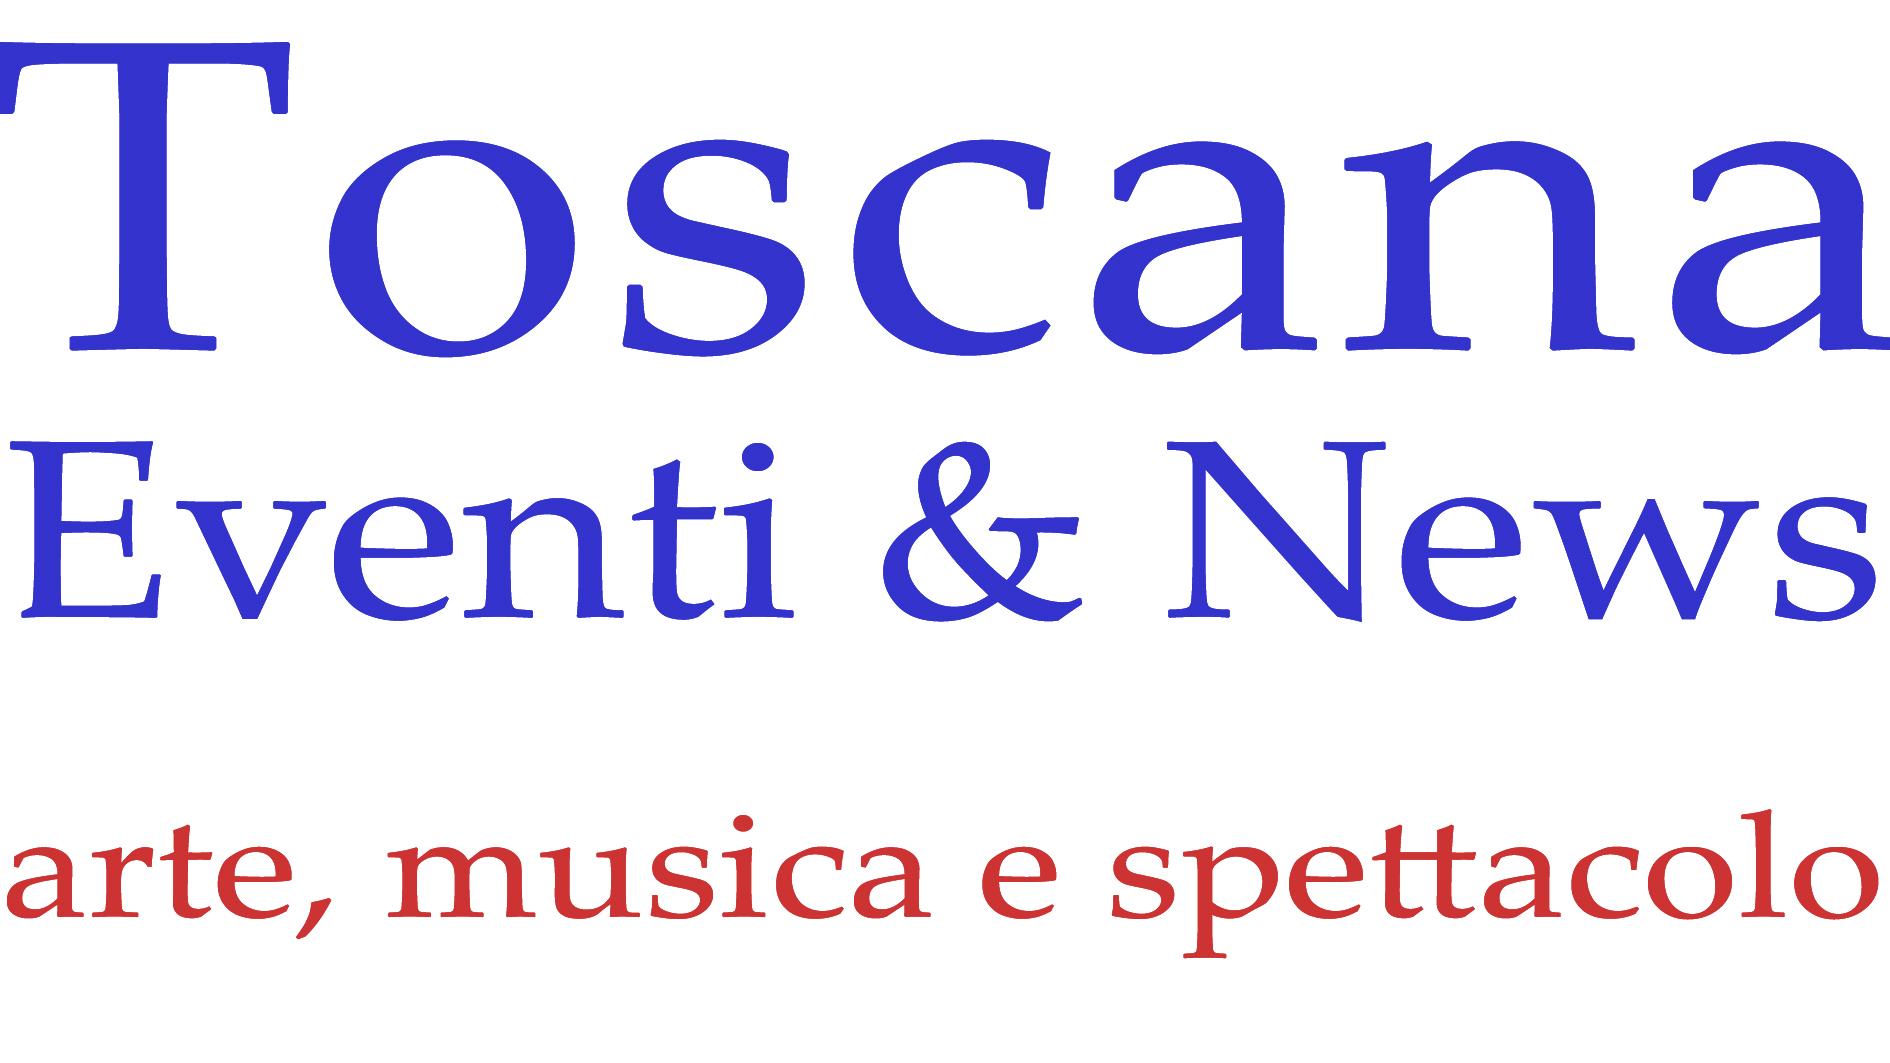 Toscana Eventi & News